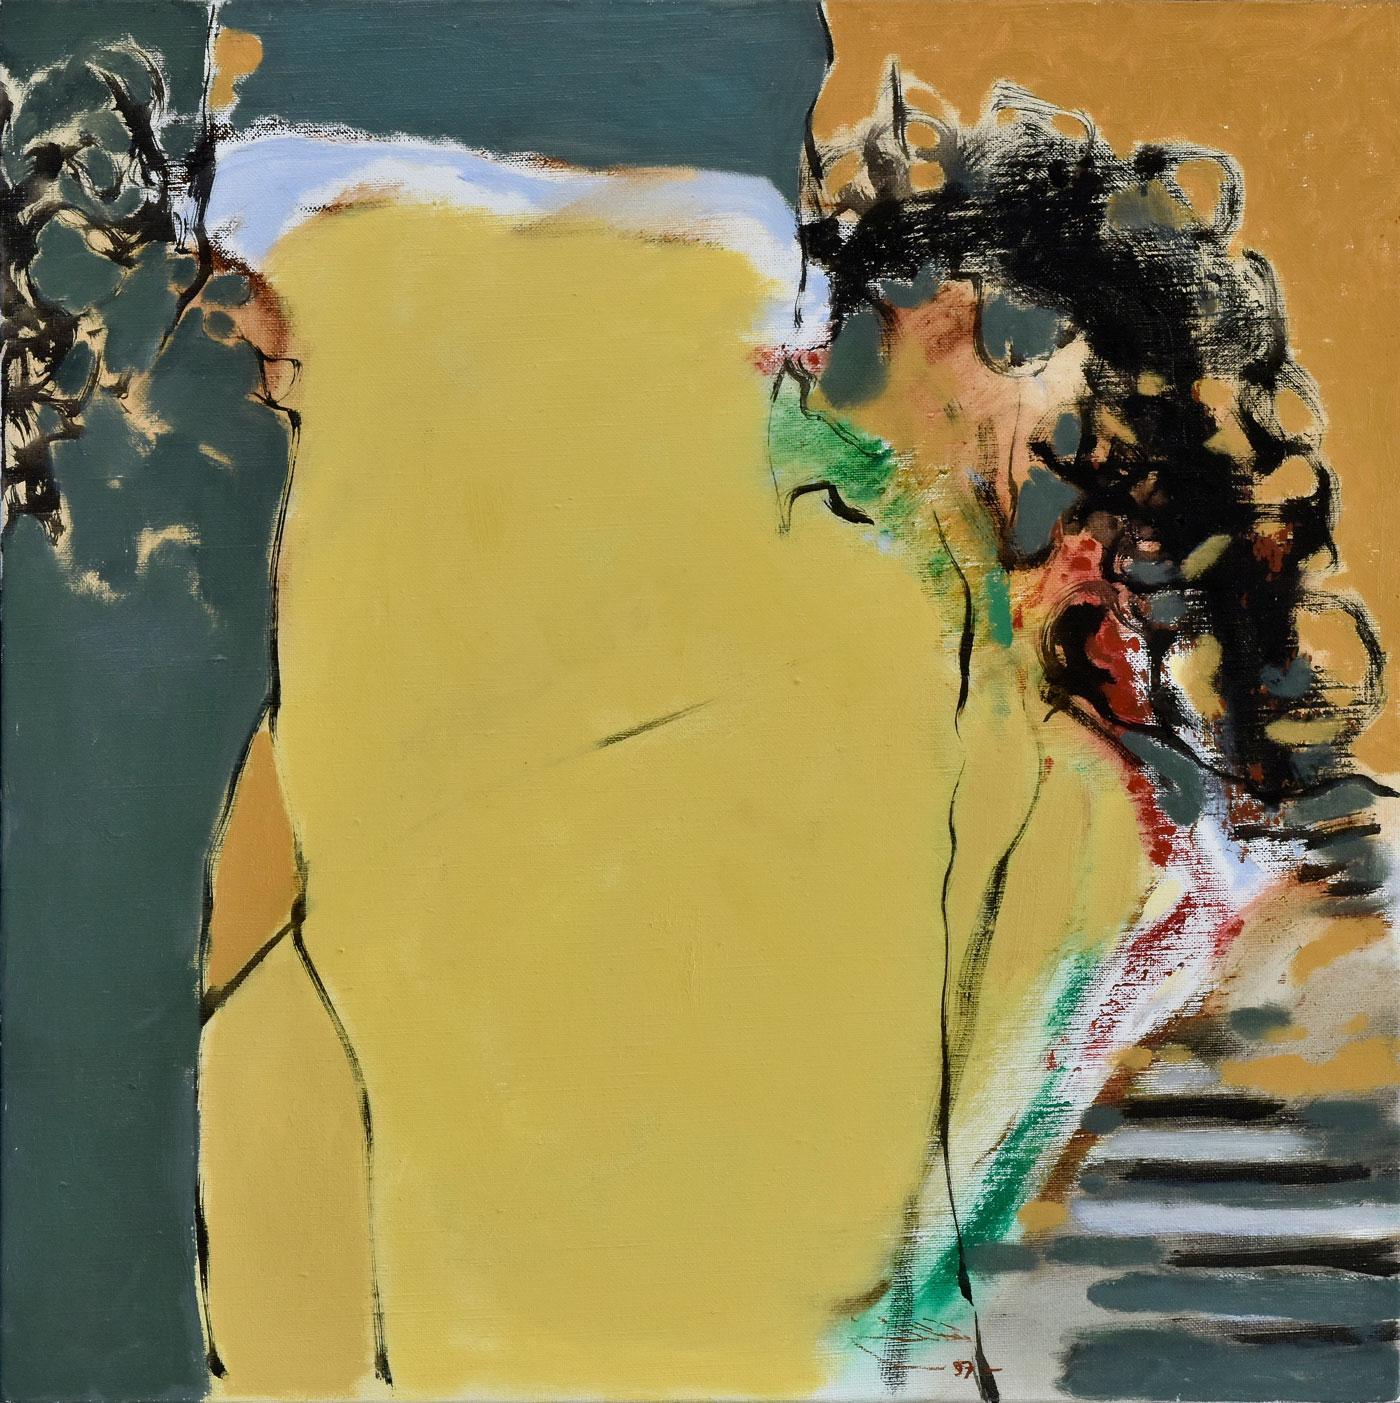 figurative-landscape-4-series rashid al khalifa